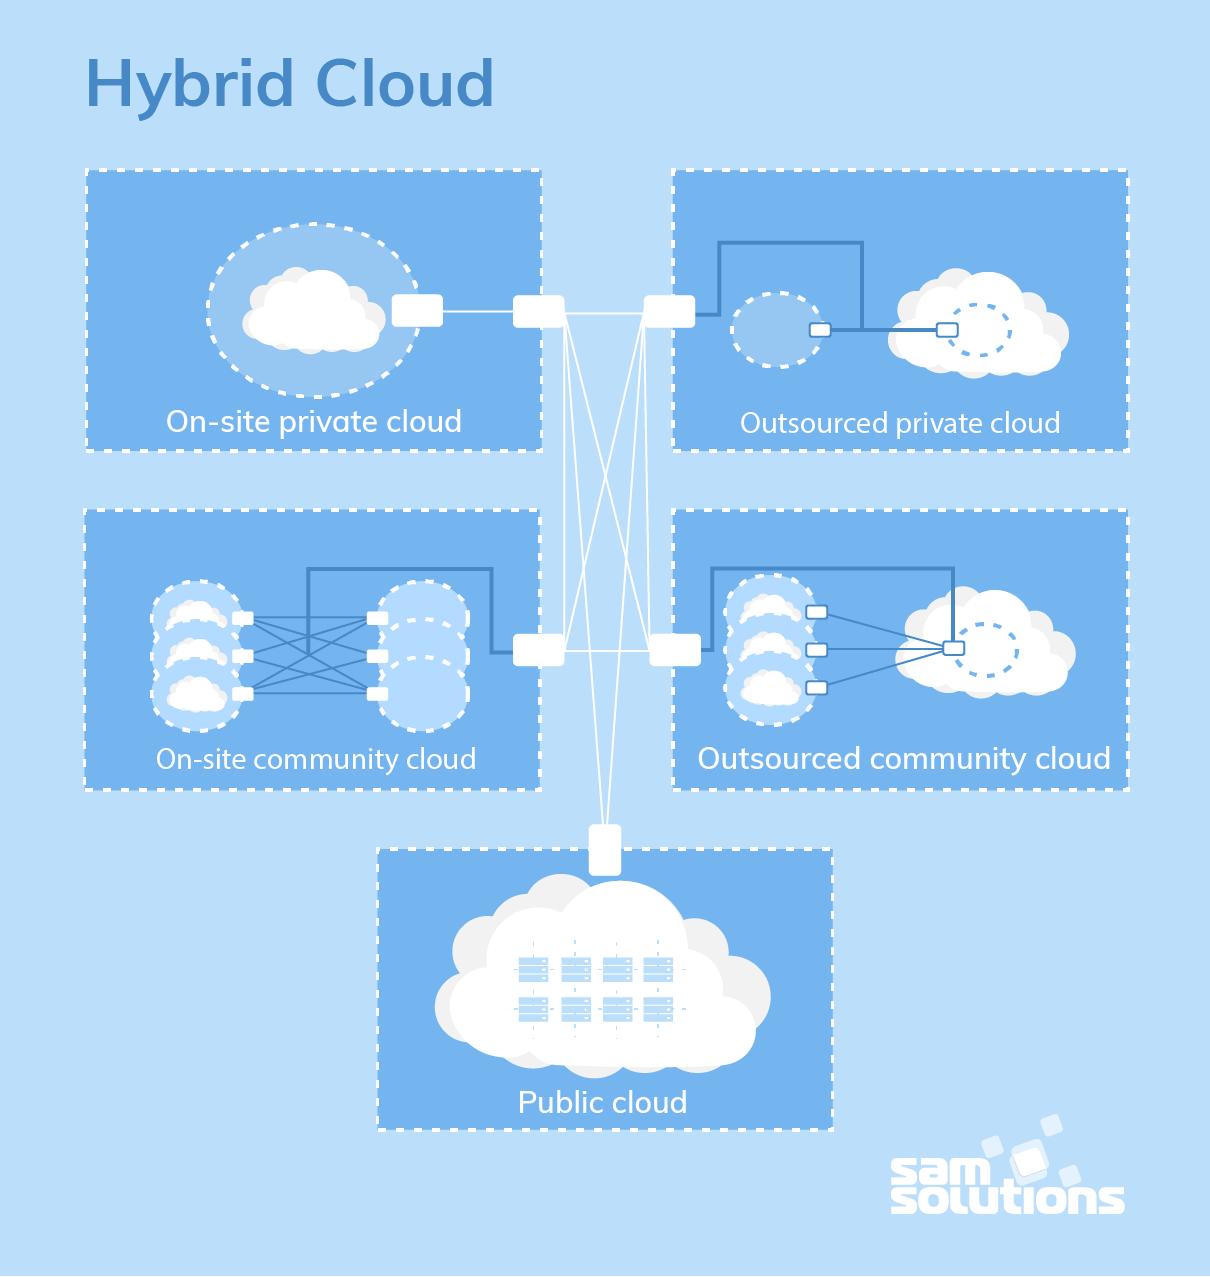 Hybrid-Cloud-Deployment-Model-image